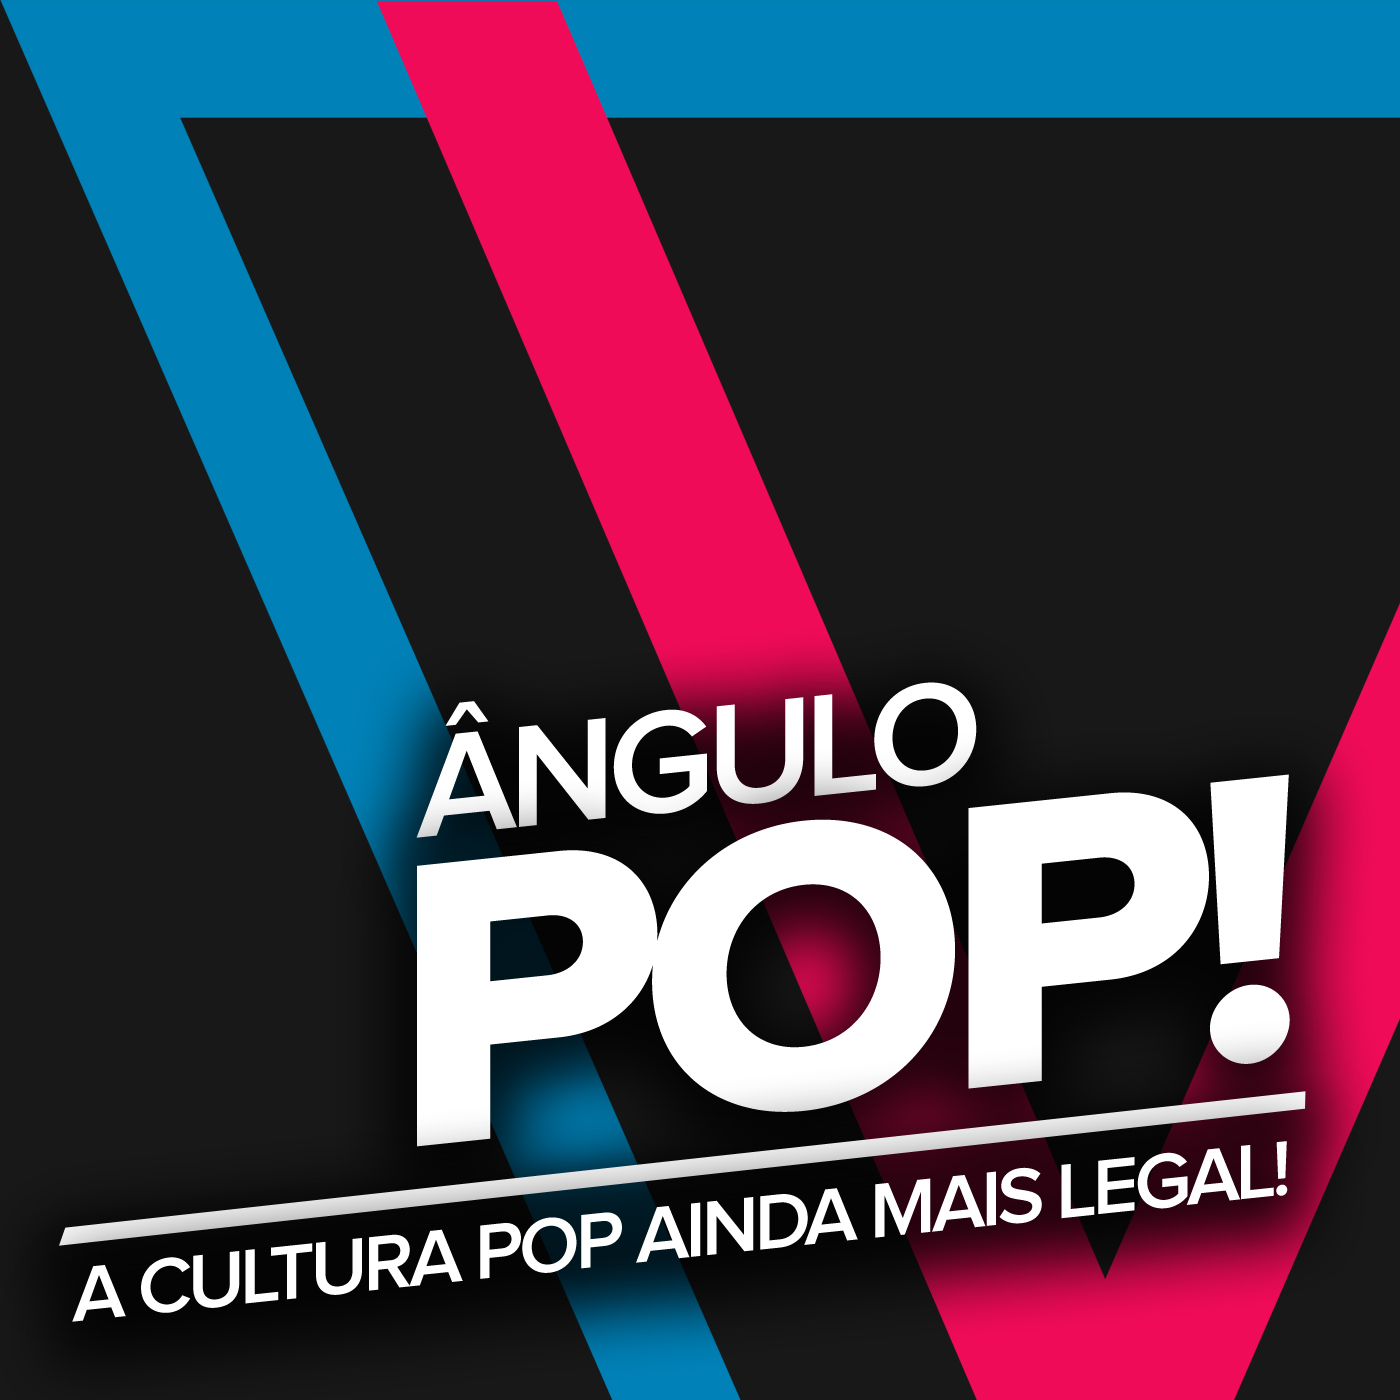 Ângulo Pop